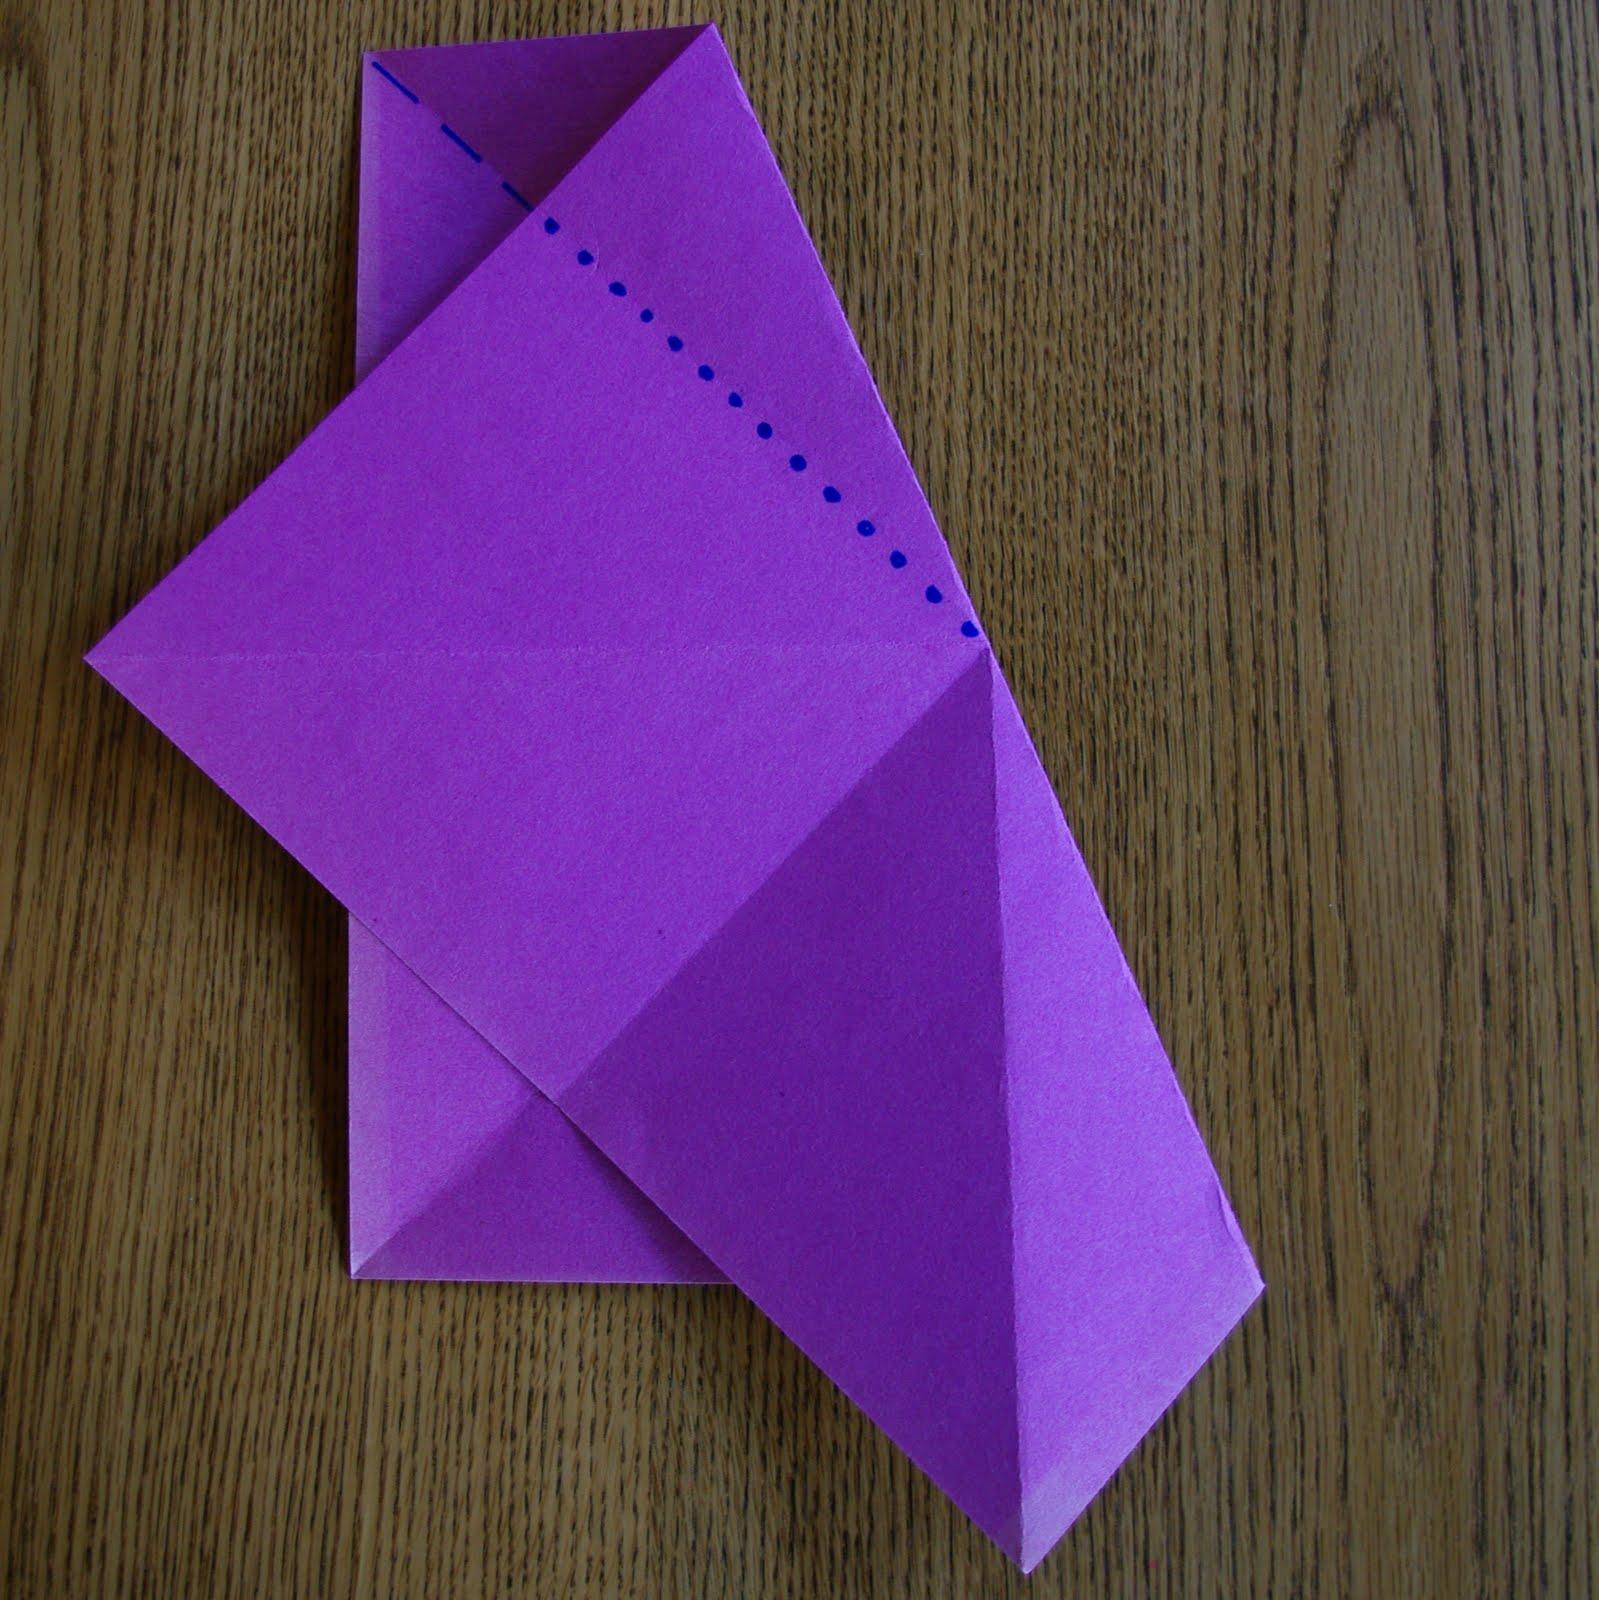 Passengers On A Little Spaceship Paper Star Lantern Tutorial